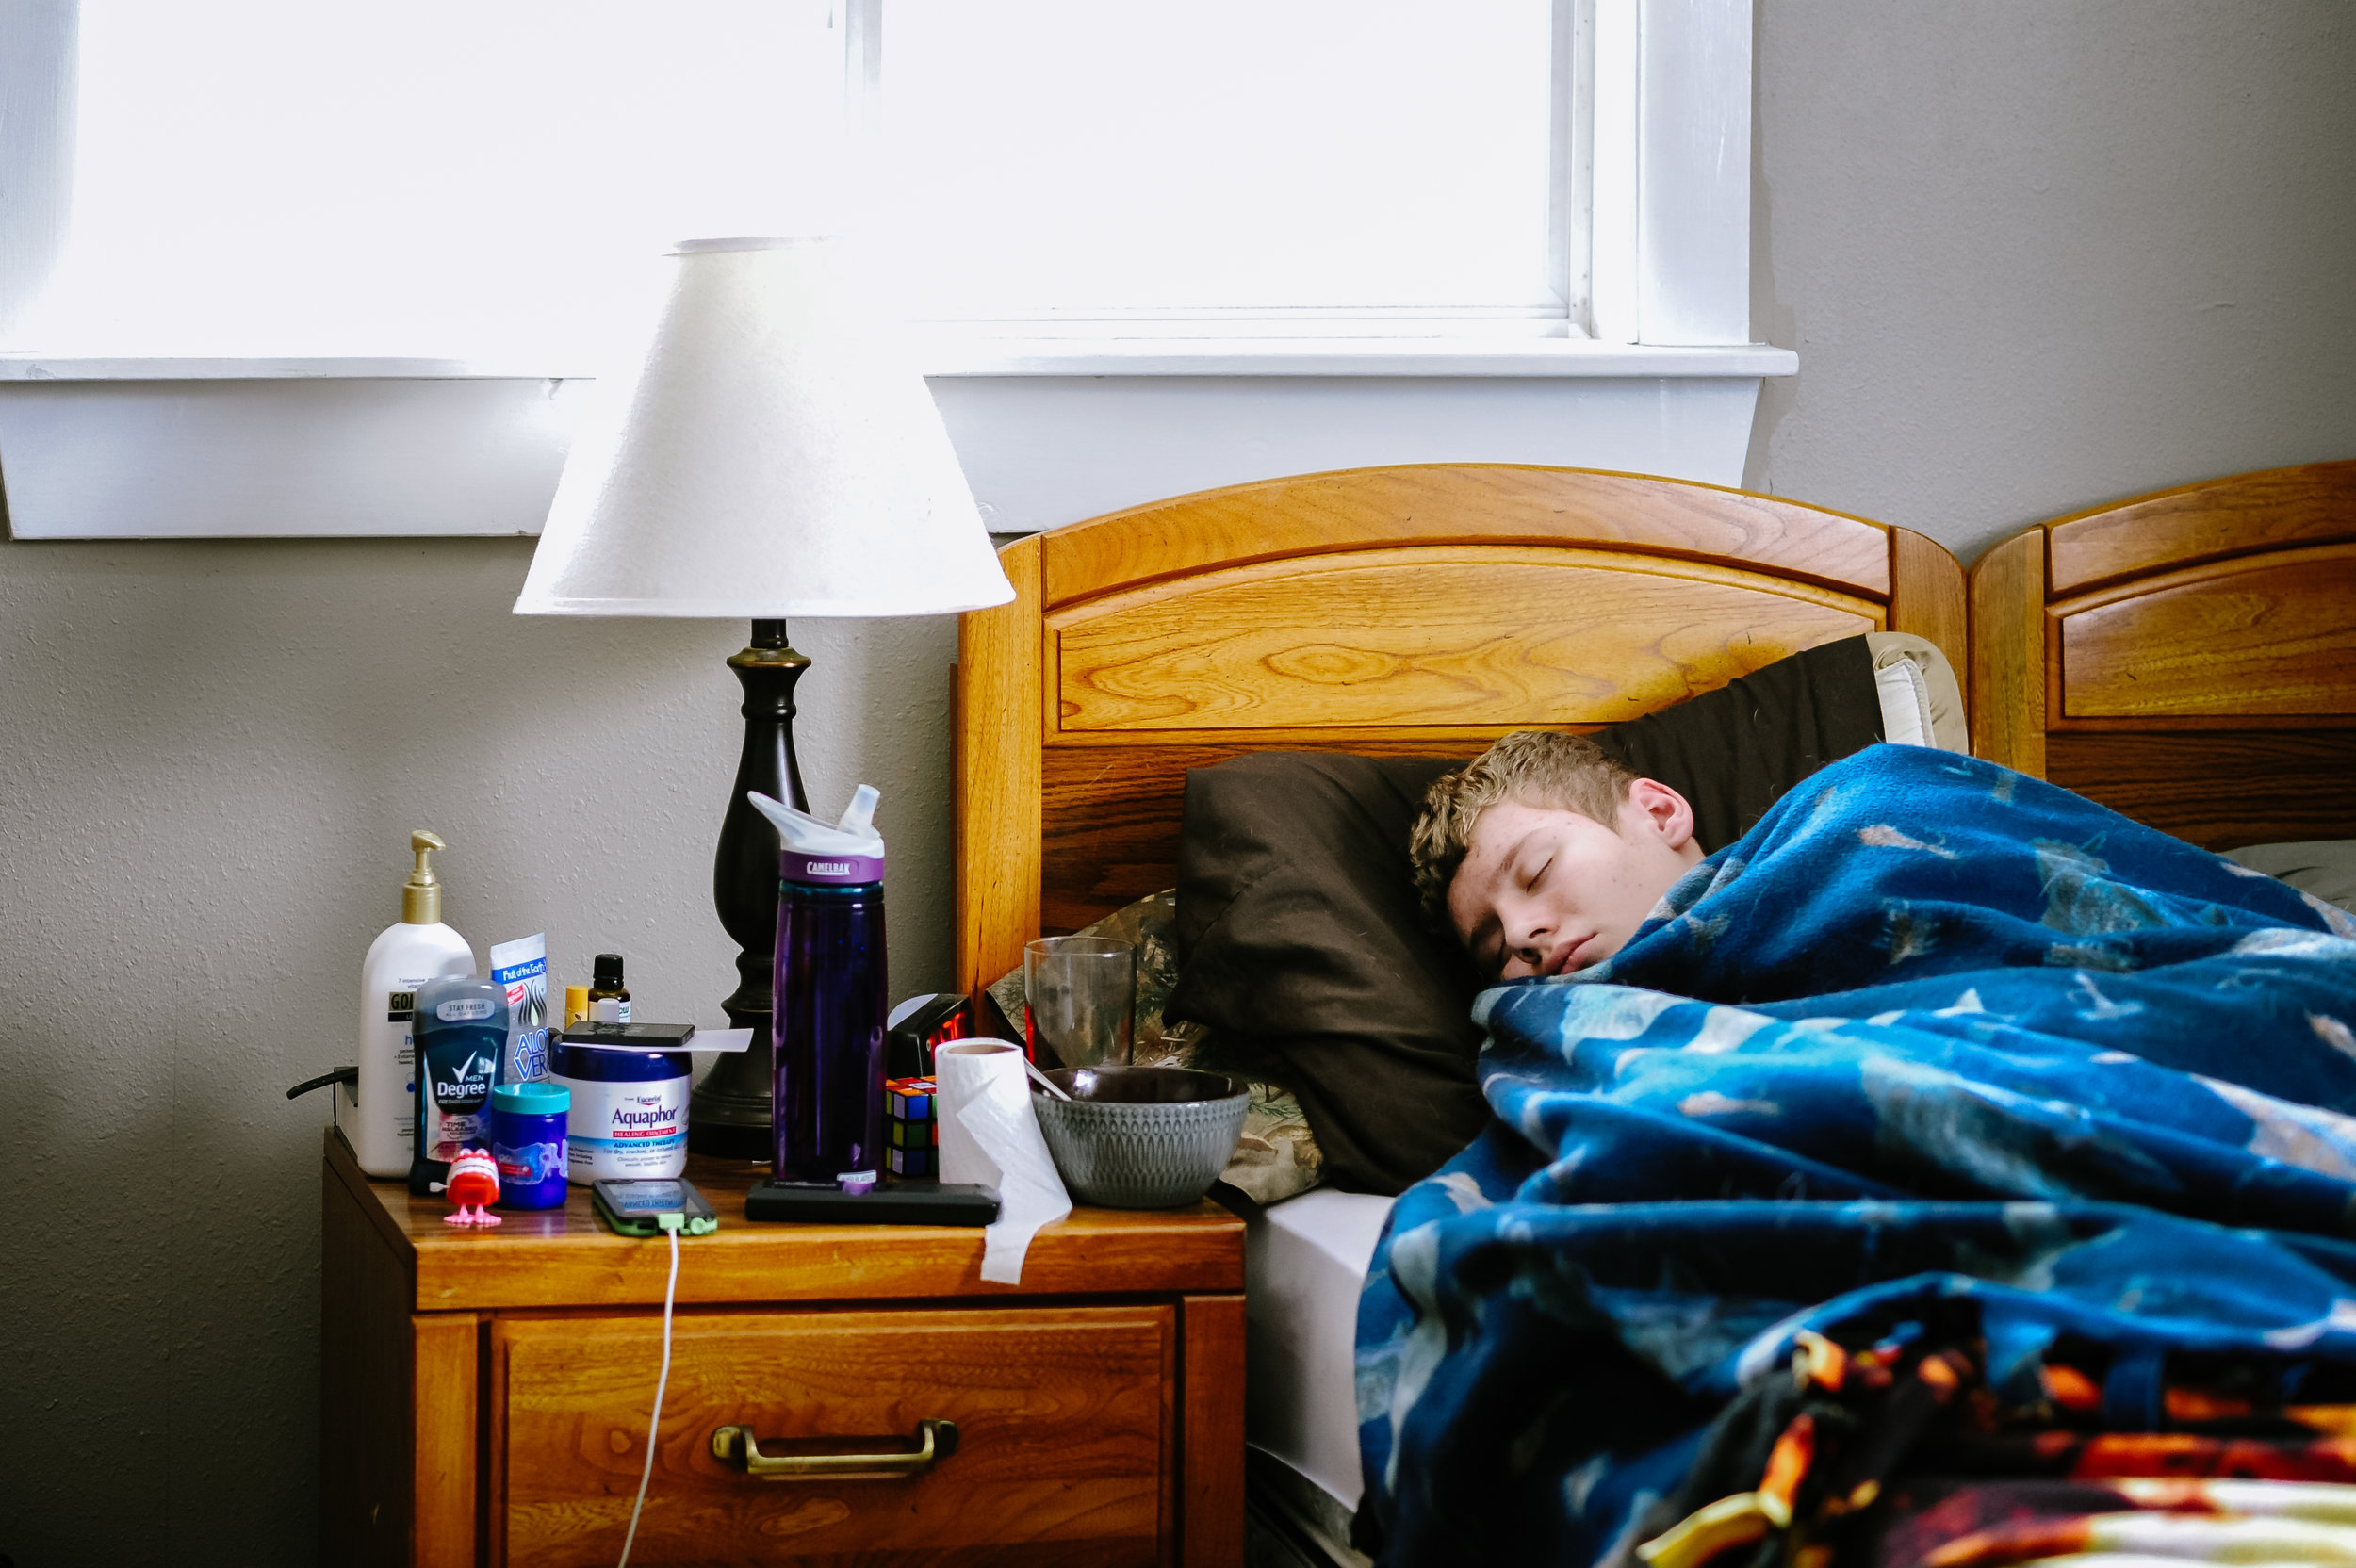 Kelly Jacobi Photography Wausau WI photographer project 365 documentary photography